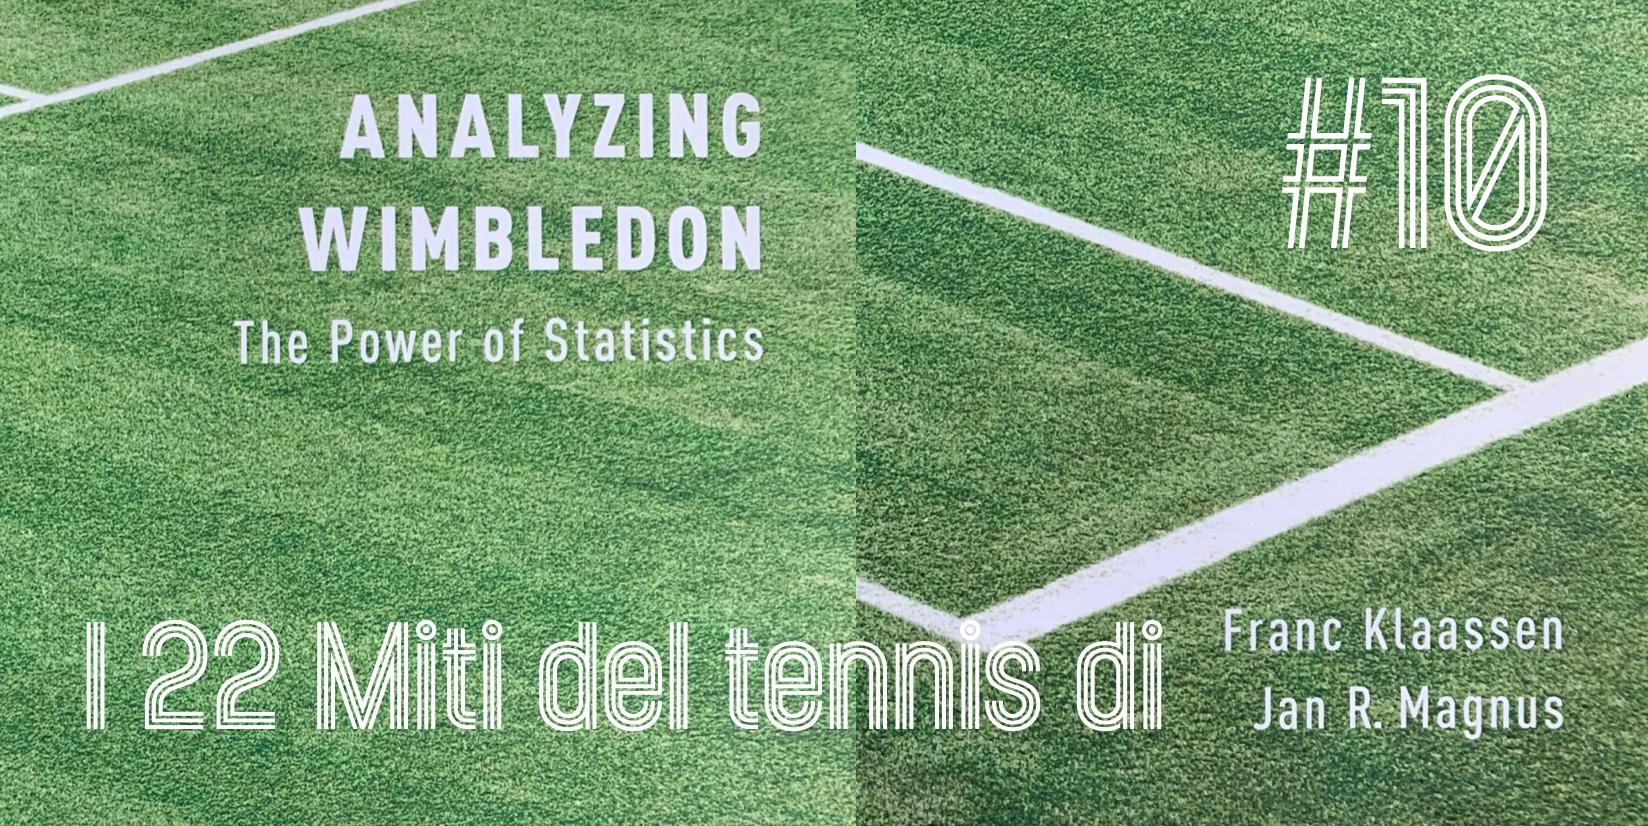 I 22 miti del tennis di Klaassen & Magnus – Mito 10 - settesei.it